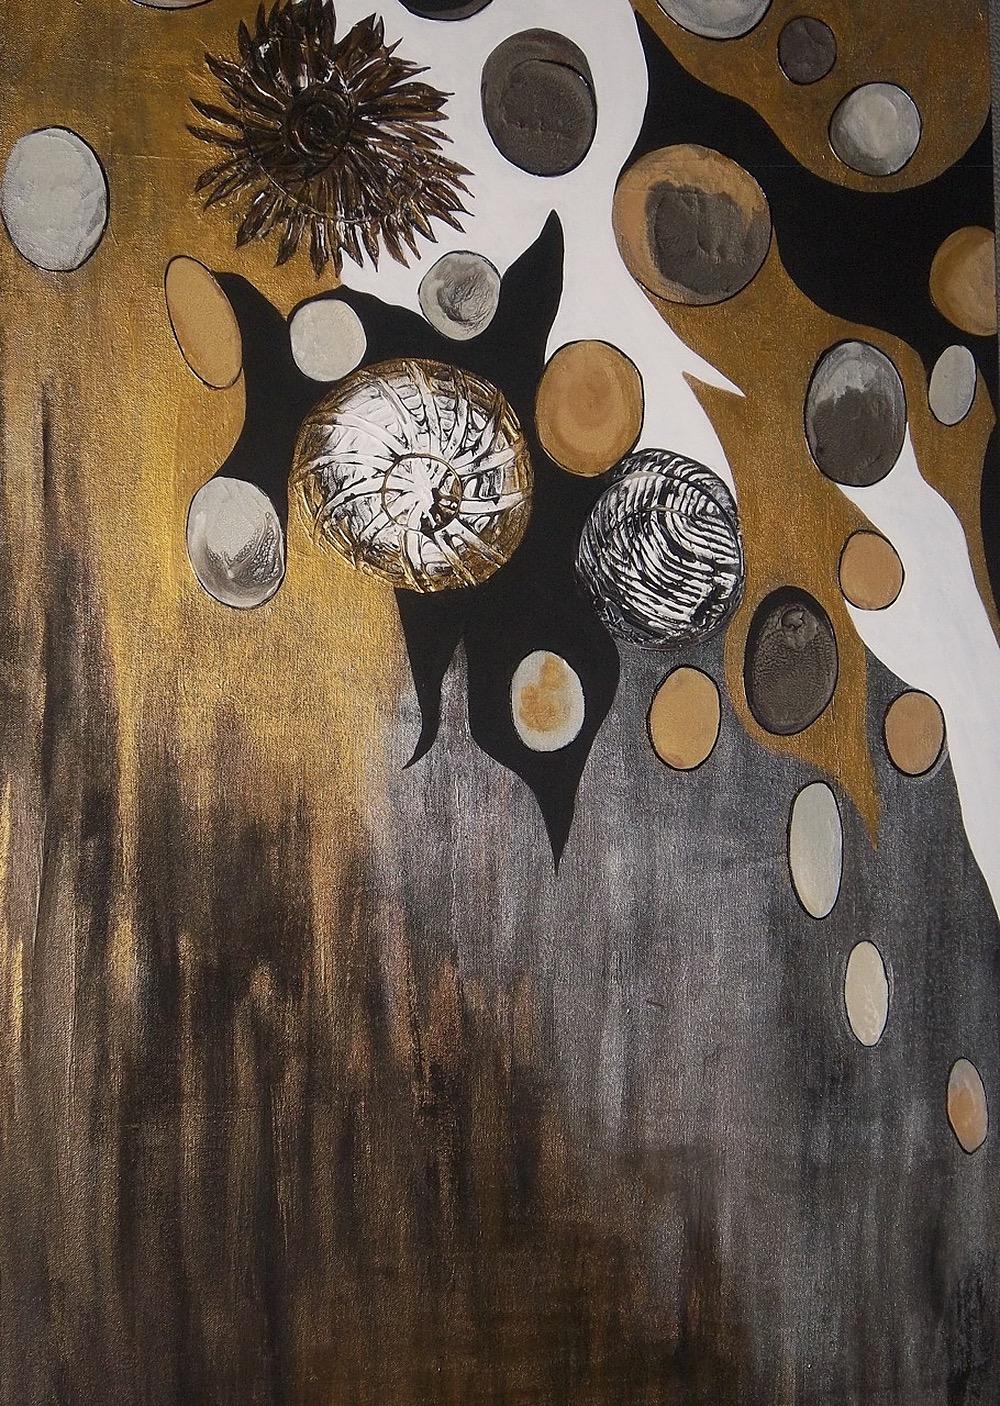 Galaxy by Helene Strebel | ArtworkNetwork.com